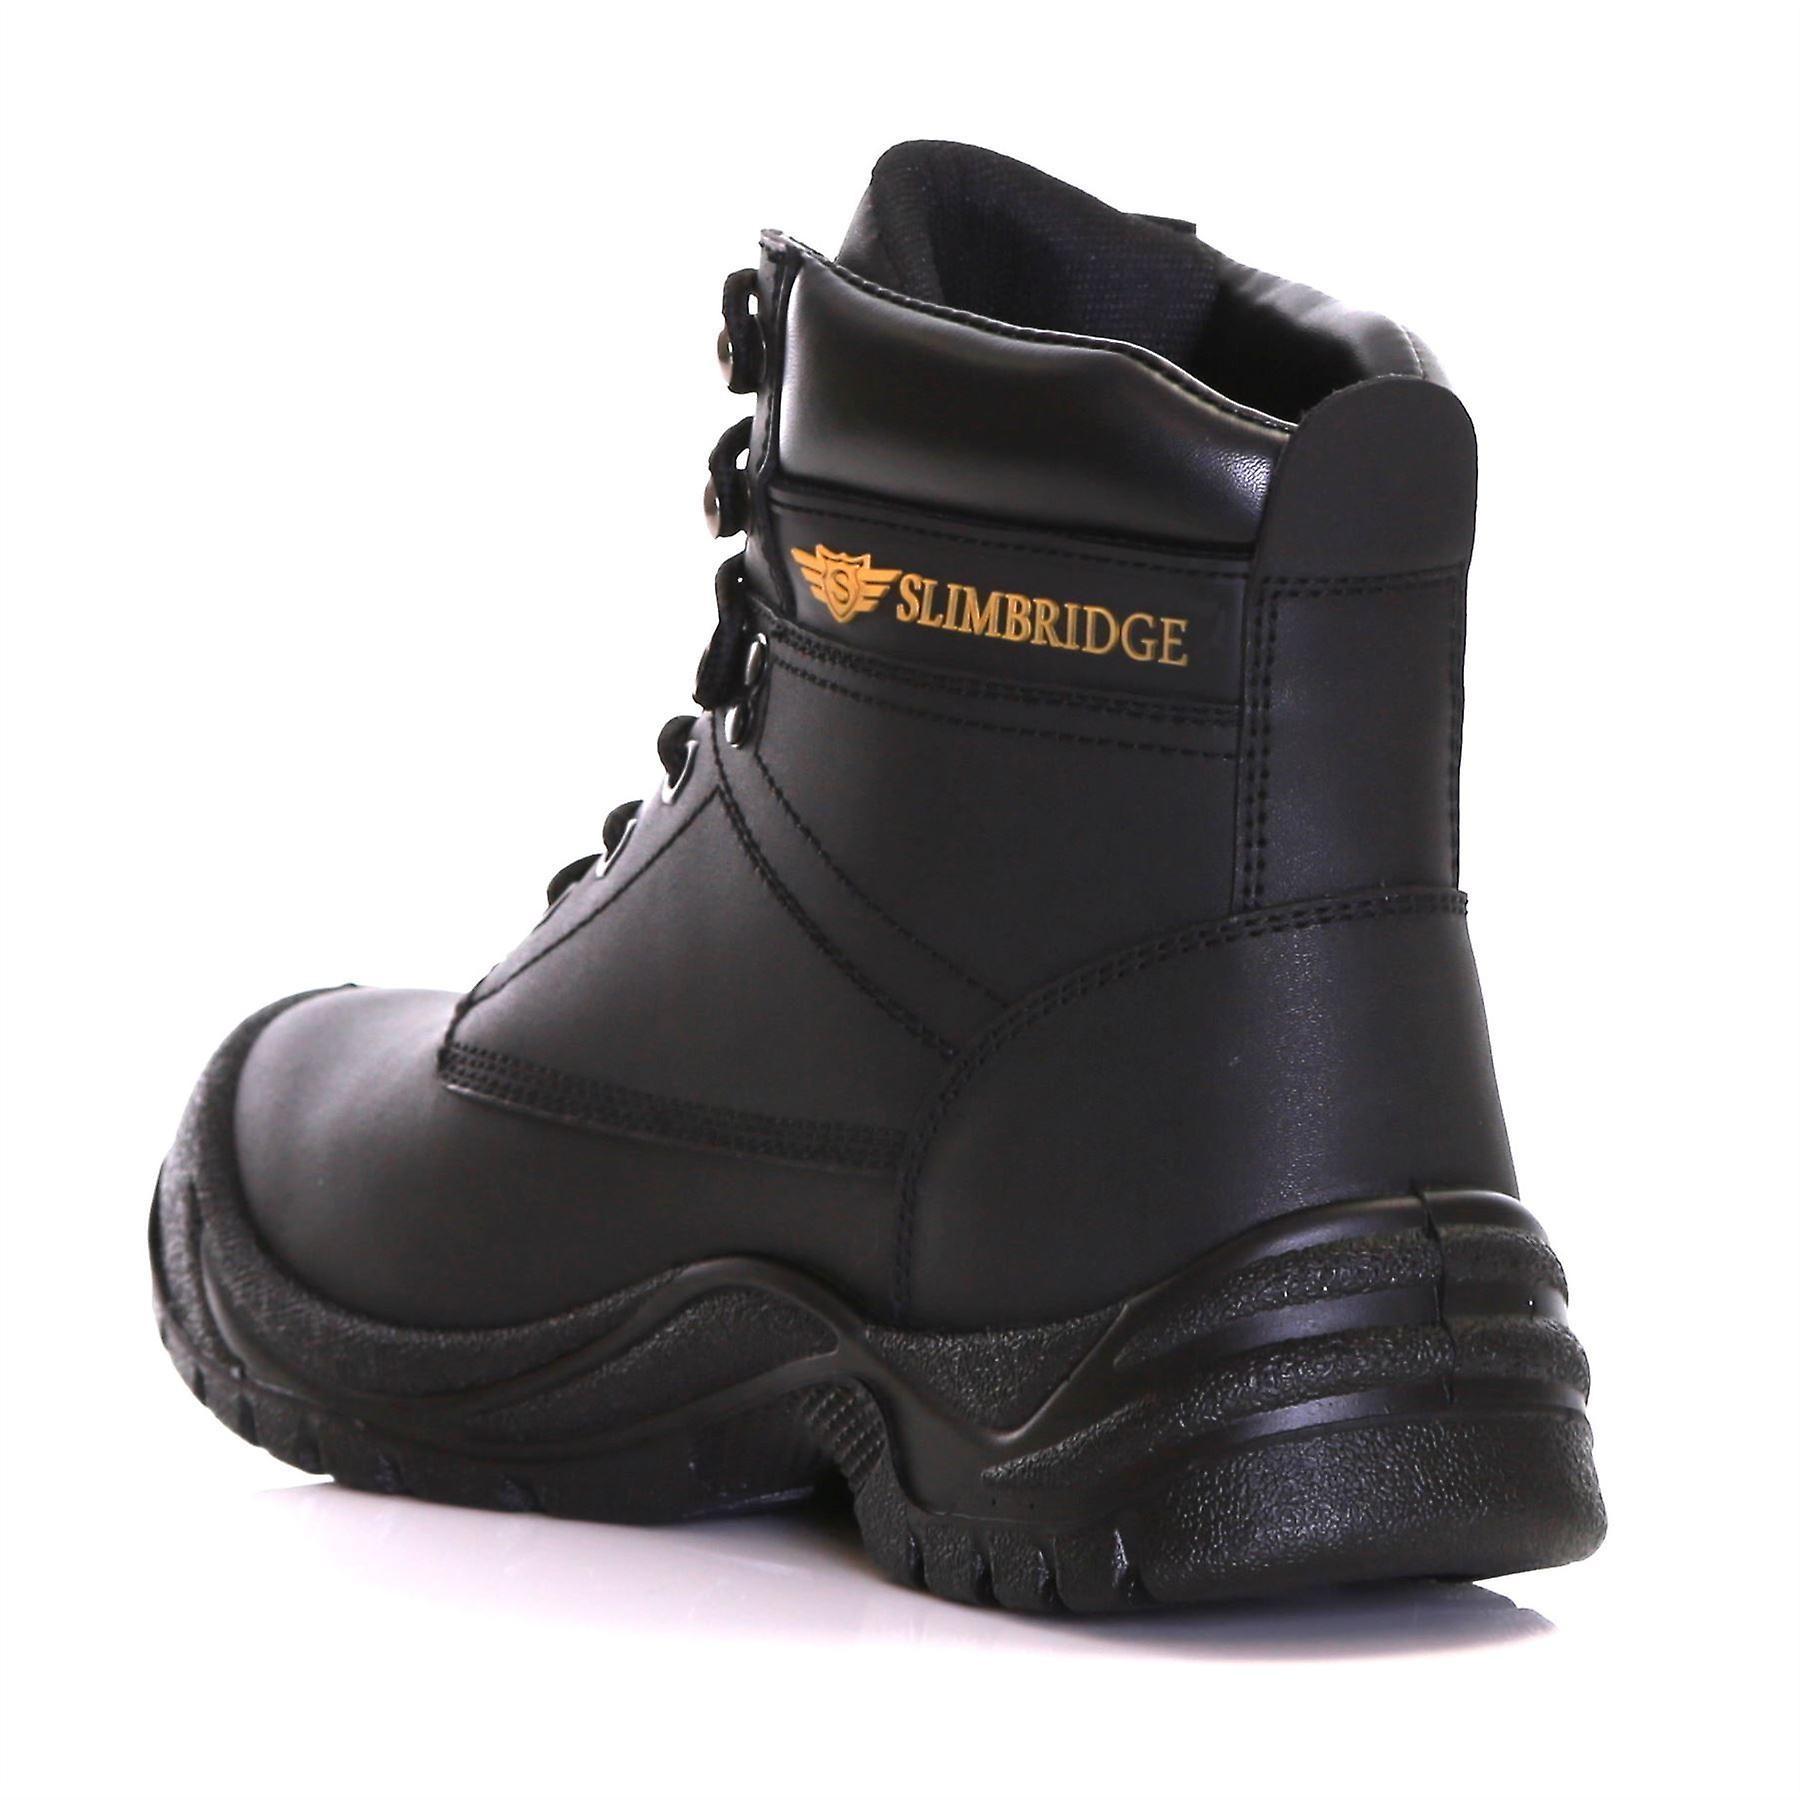 Slimbridge Velbert Size 12 Safety Boots, Black